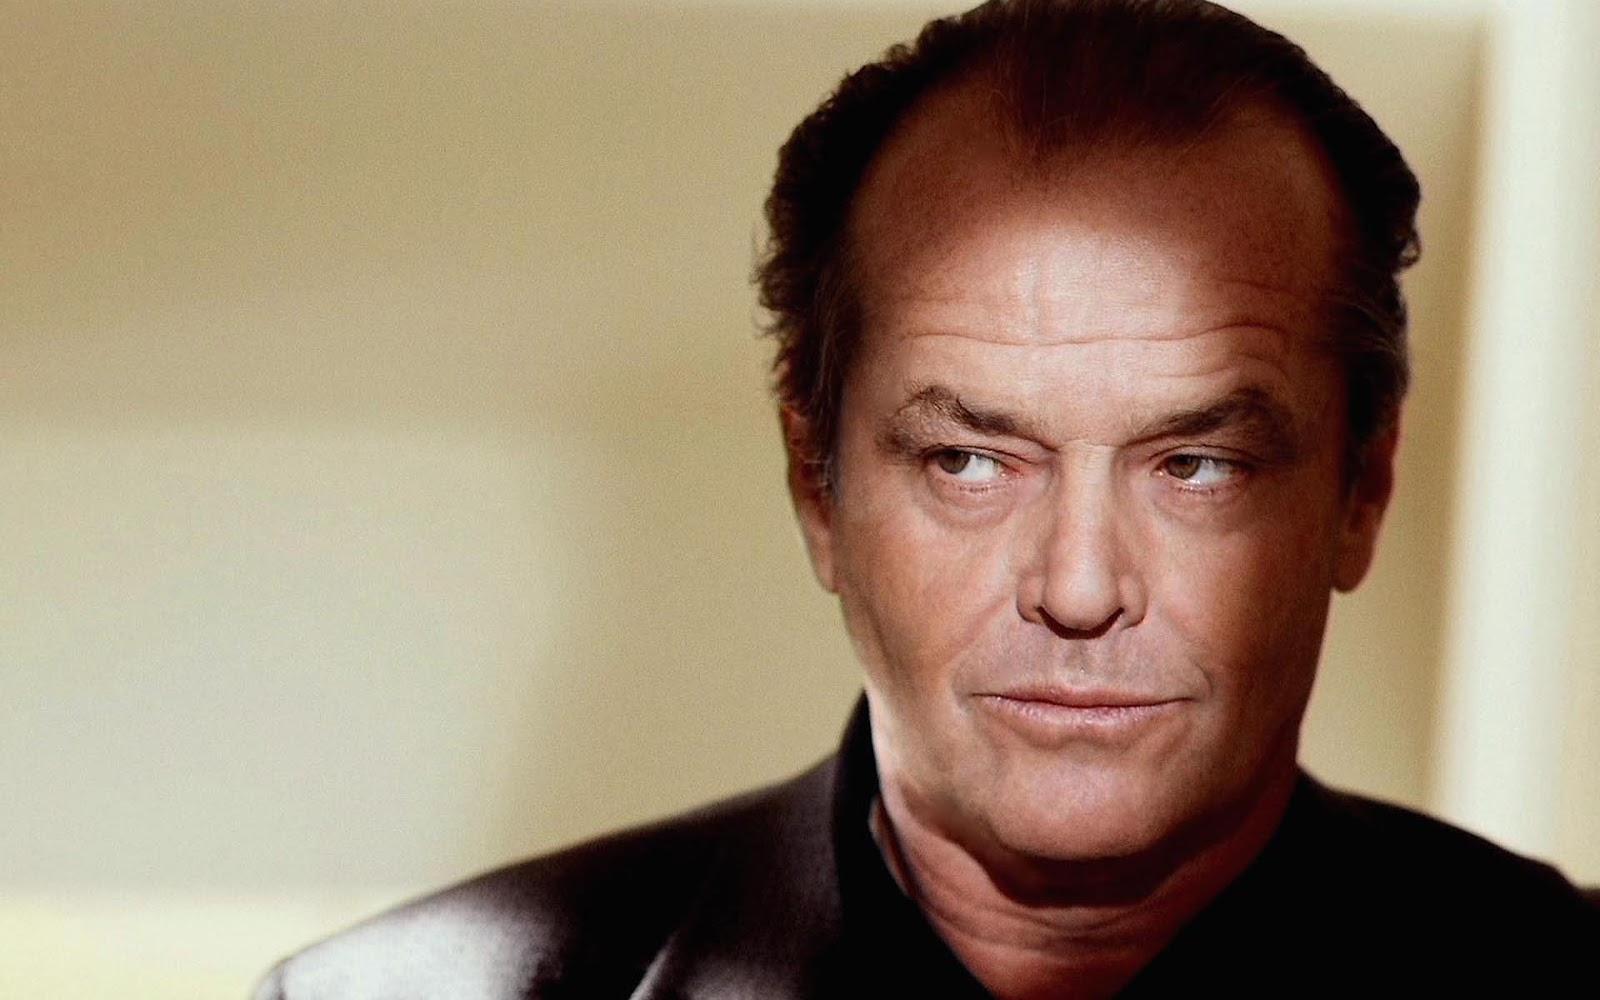 Jack Nicholson Hd Wallpaper 7607   HD Desktop Wallpaper 1600x1000